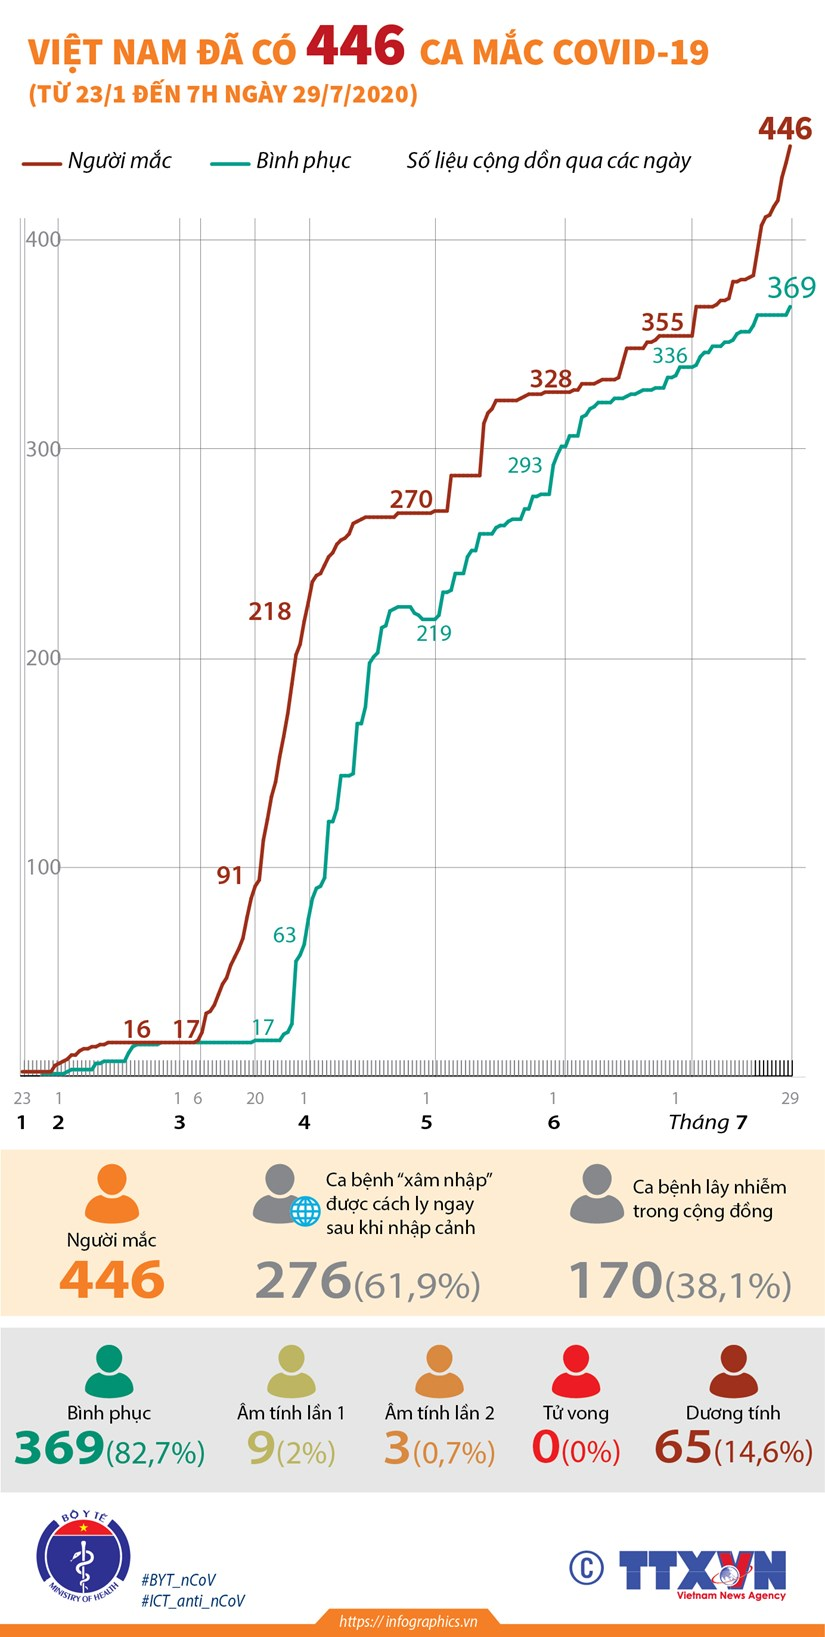 [Infographics] Viet Nam da ghi nhan 446 ca mac COVID-19 hinh anh 1